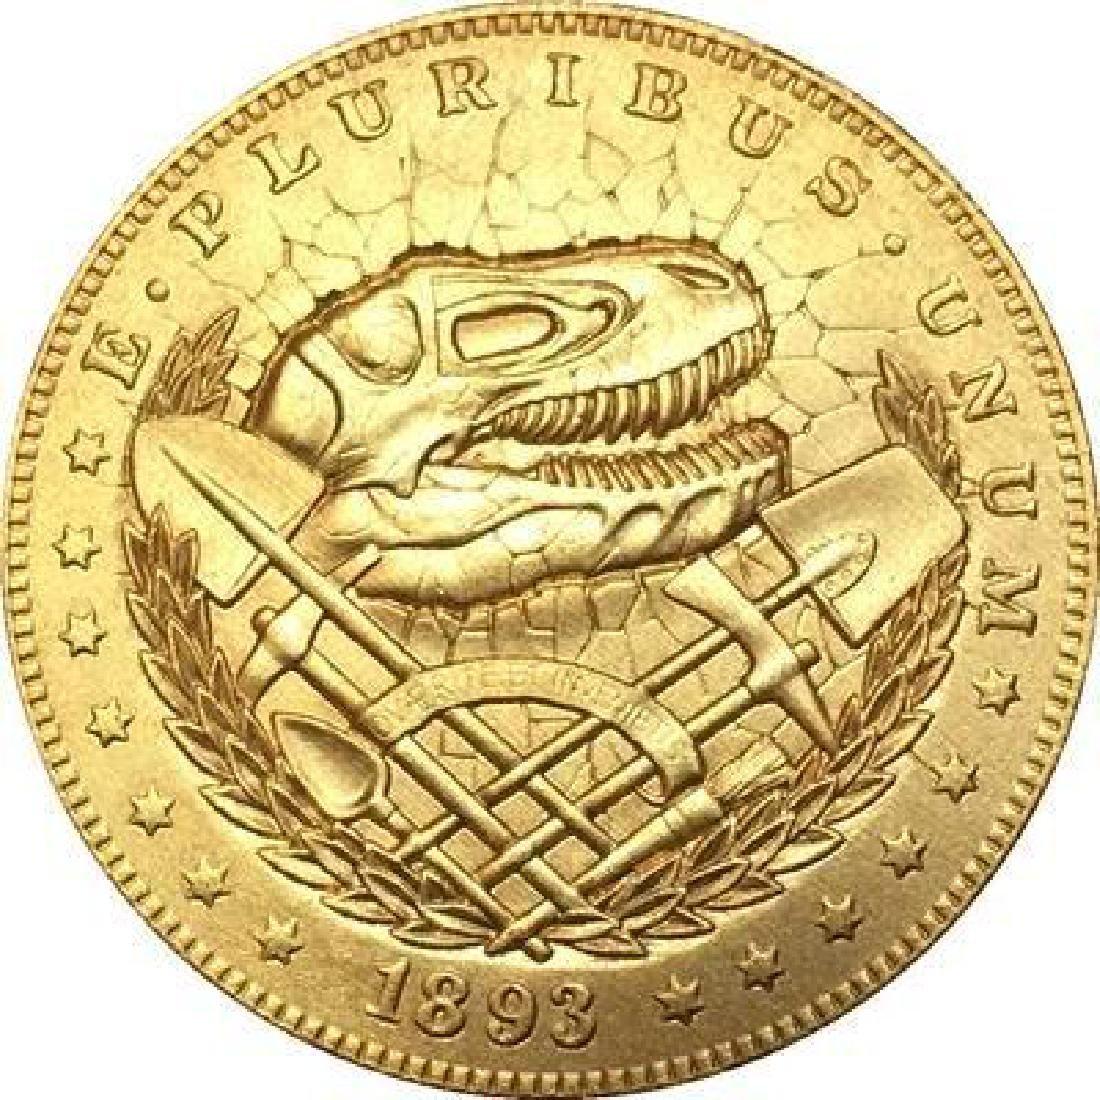 1893 USA Dinosaur Skull Gold Colored Coin